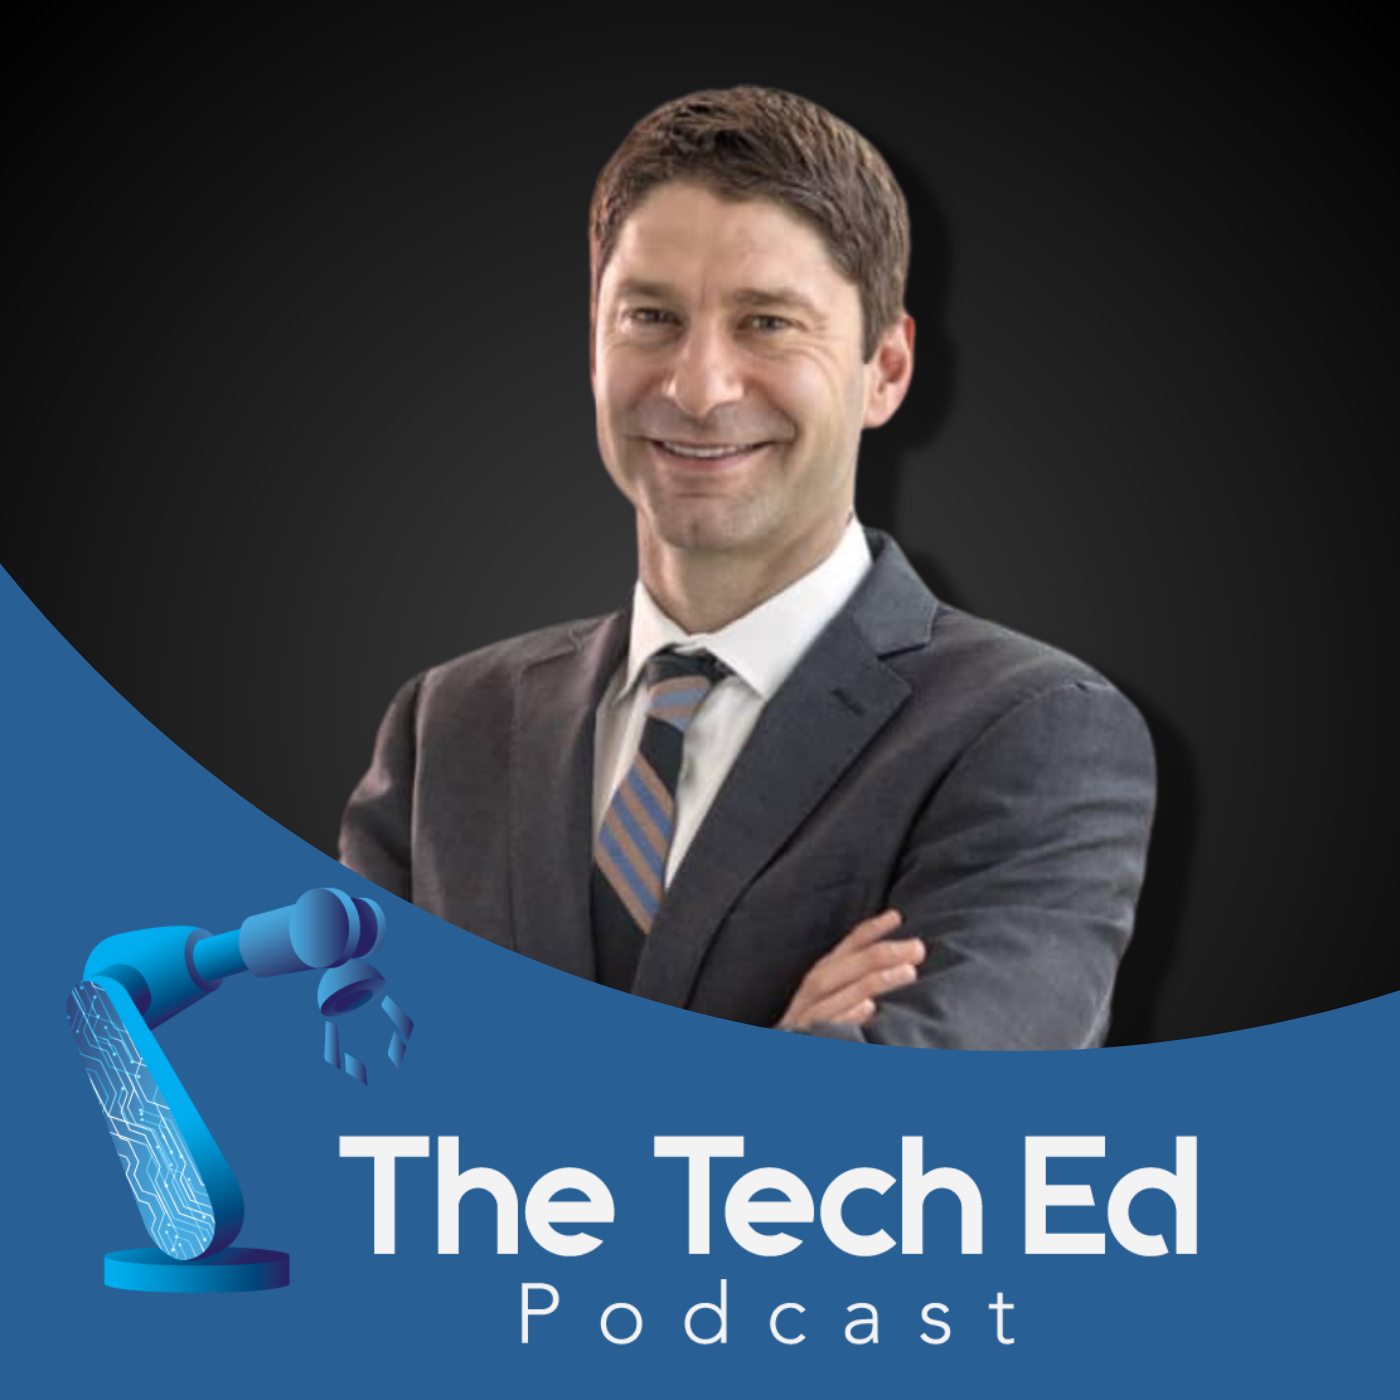 Austin Ramirez on The TechEd Podcast